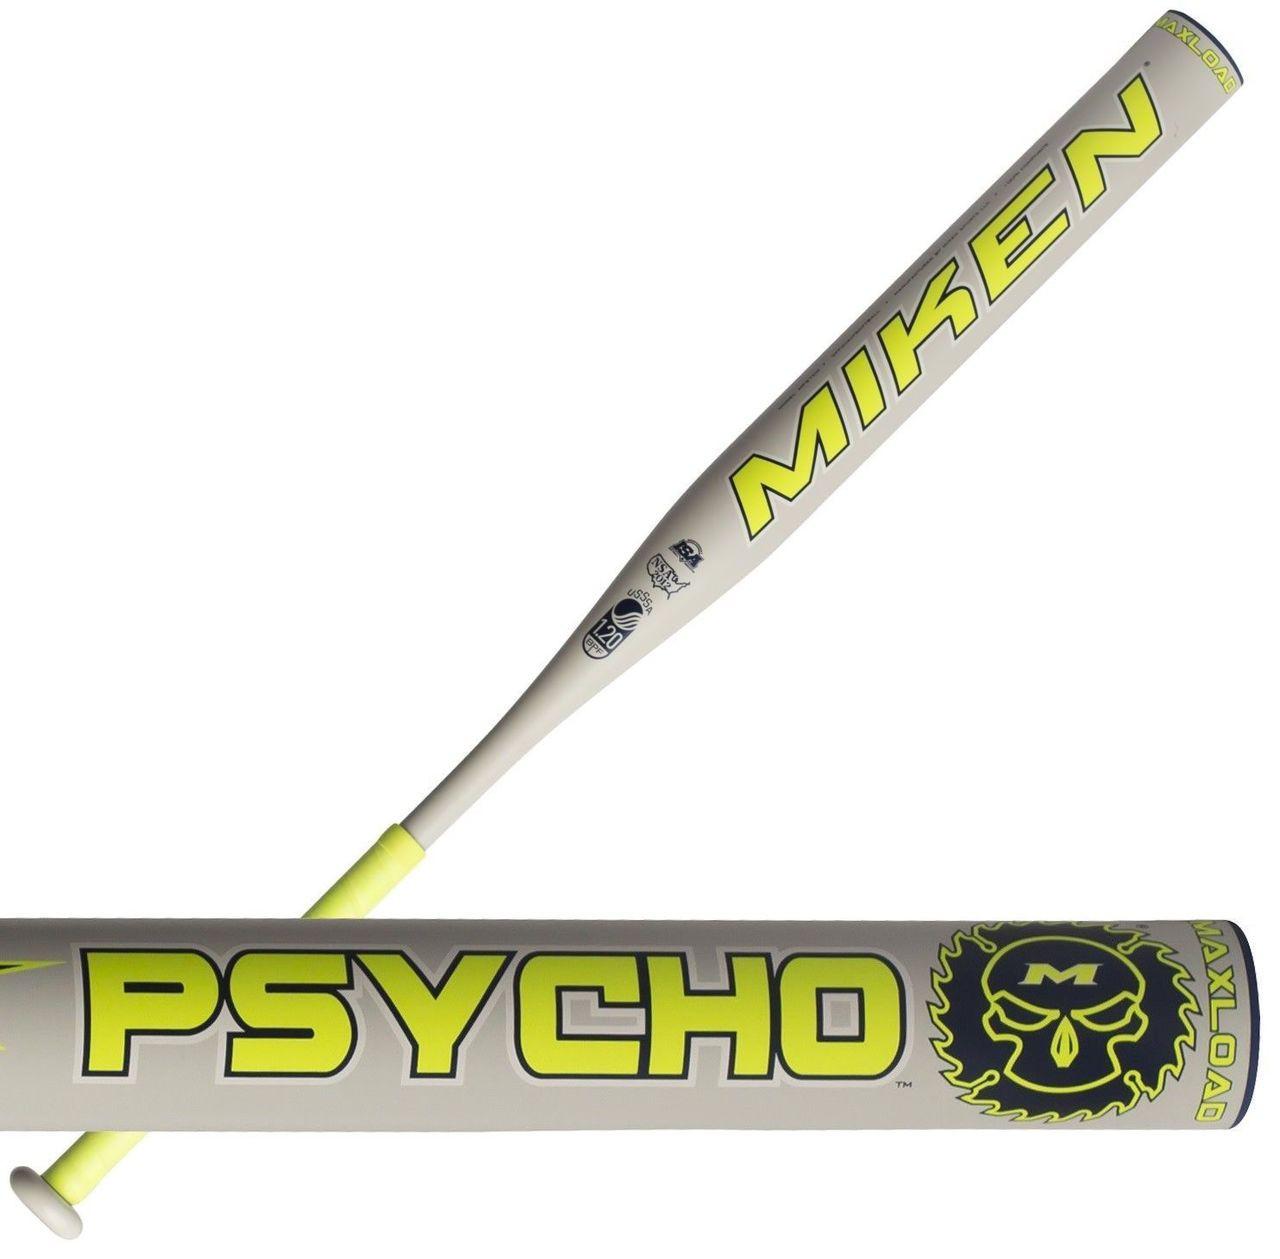 Miken Psycho Max USSSA Slowpitch Softball Bat MPSYCO 34 inch 26 oz